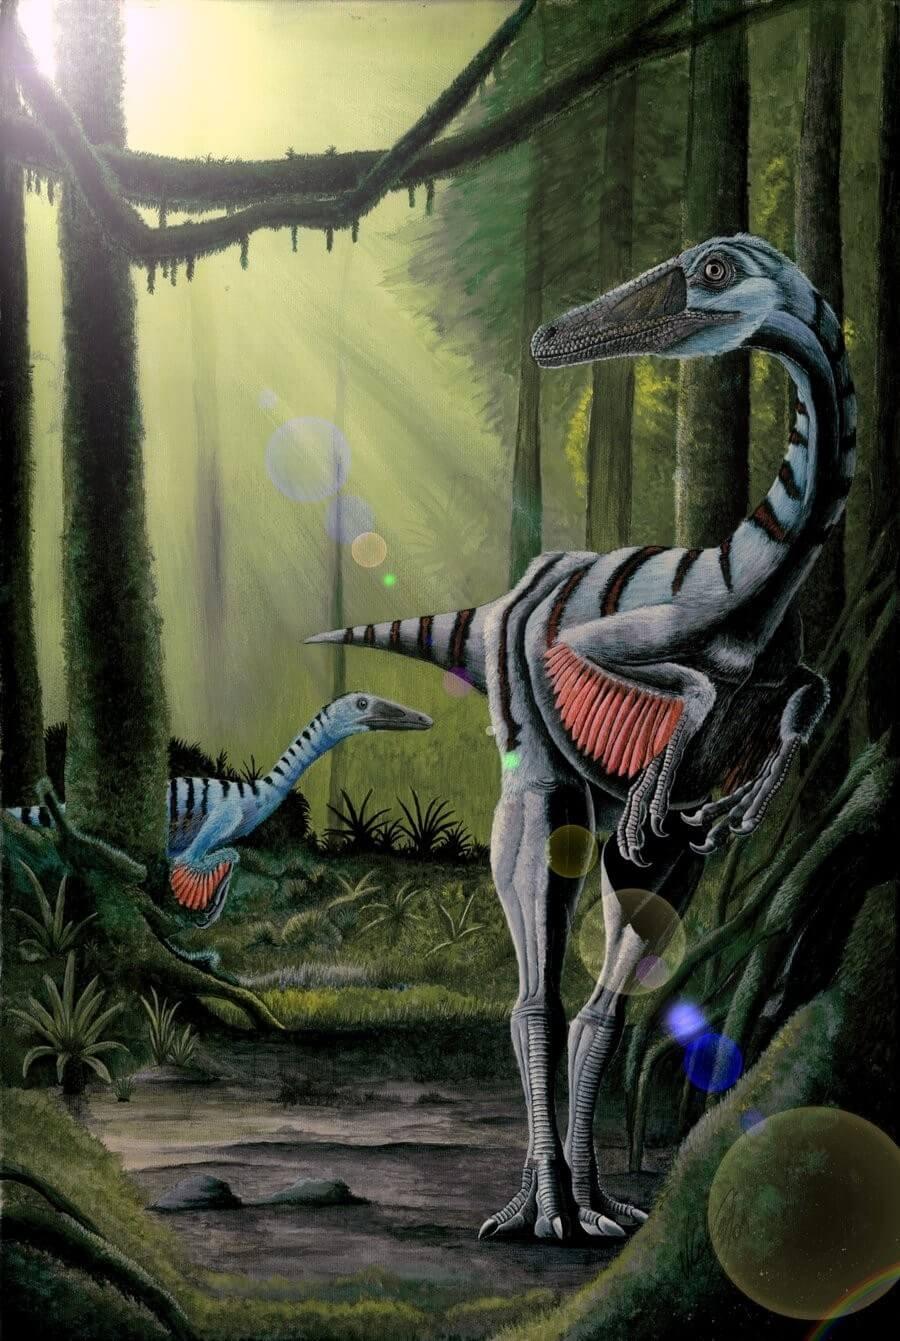 Elopteryx - Original image